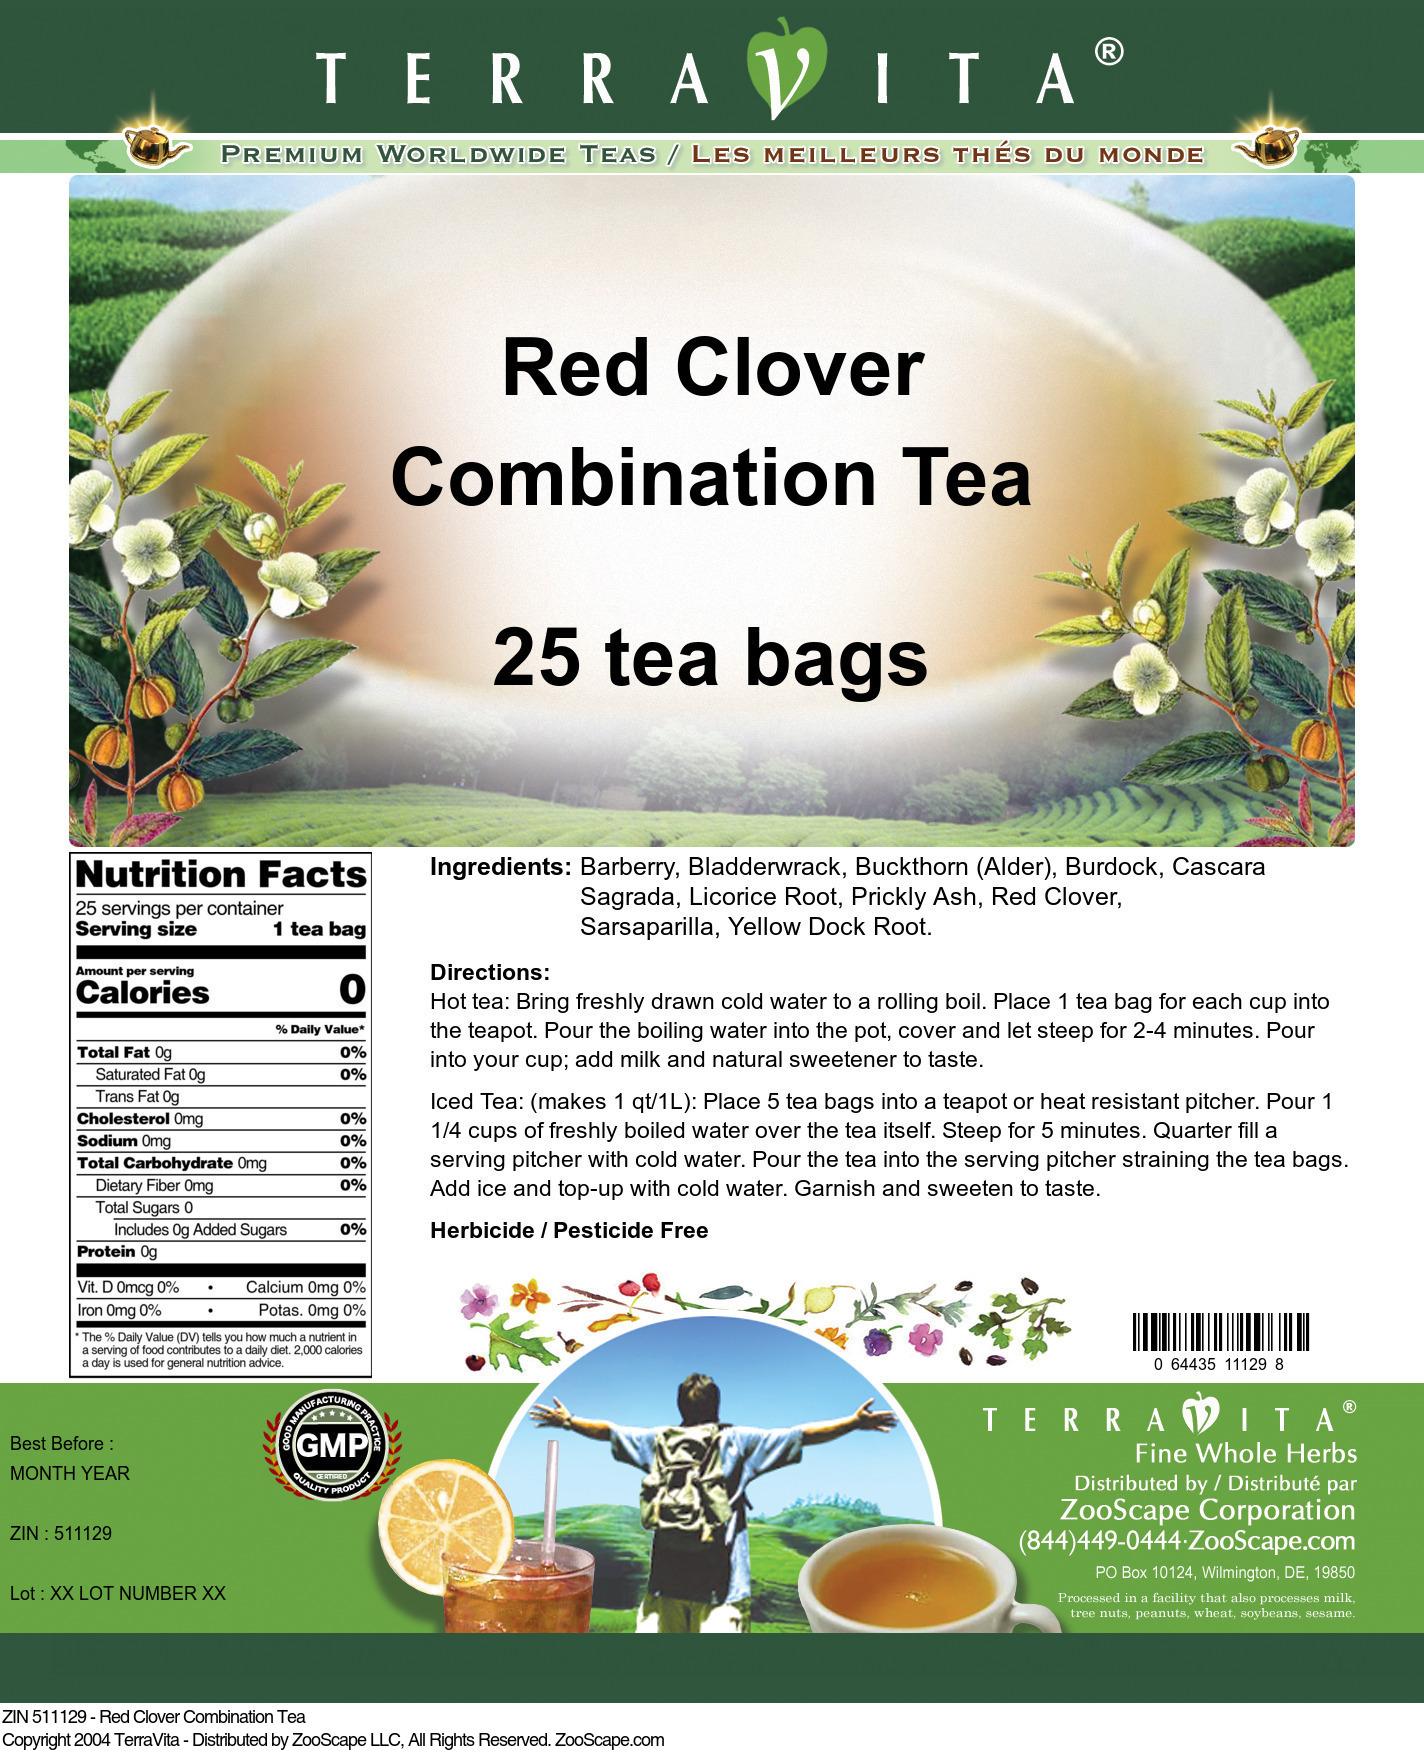 Red Clover Combination Tea - Label